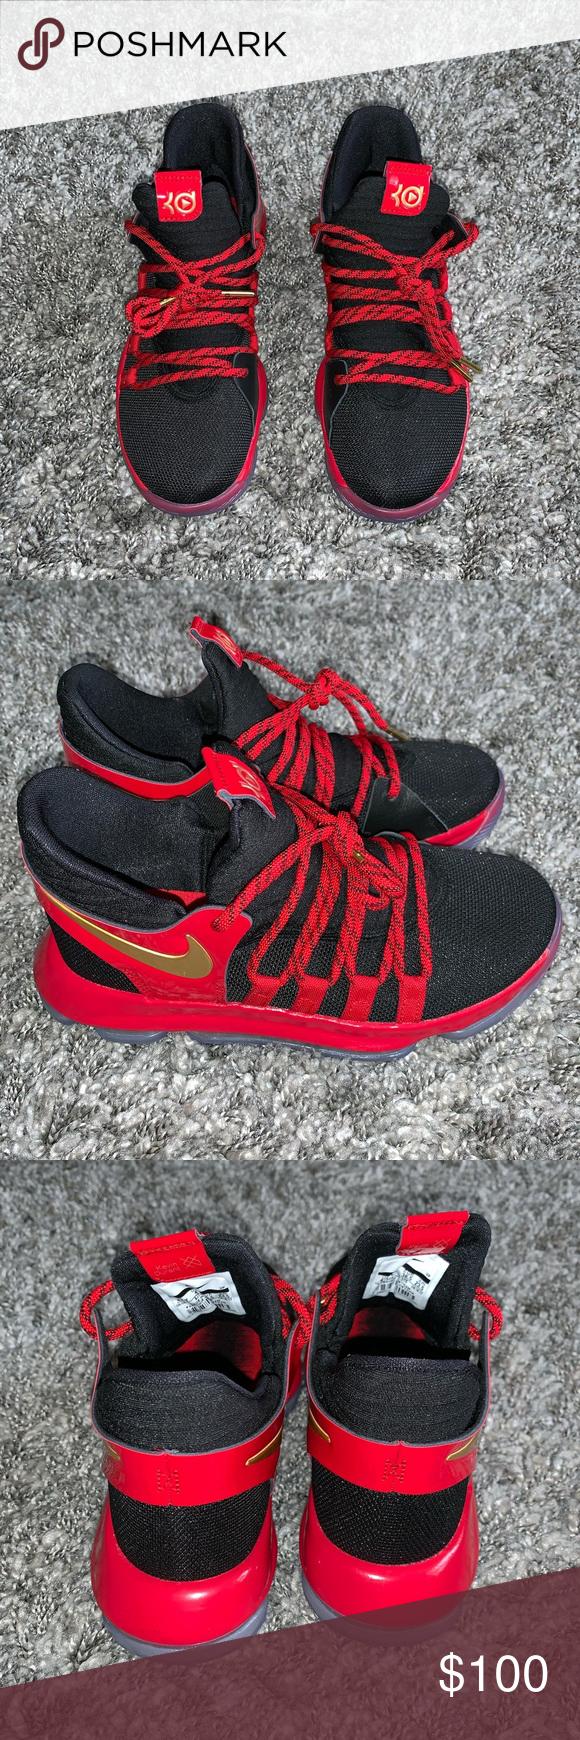 95b7deecd7be NWOT NIKE KD 10 LE GS Youth Sneakers Size 4.5Y Color  Black Metallic ...